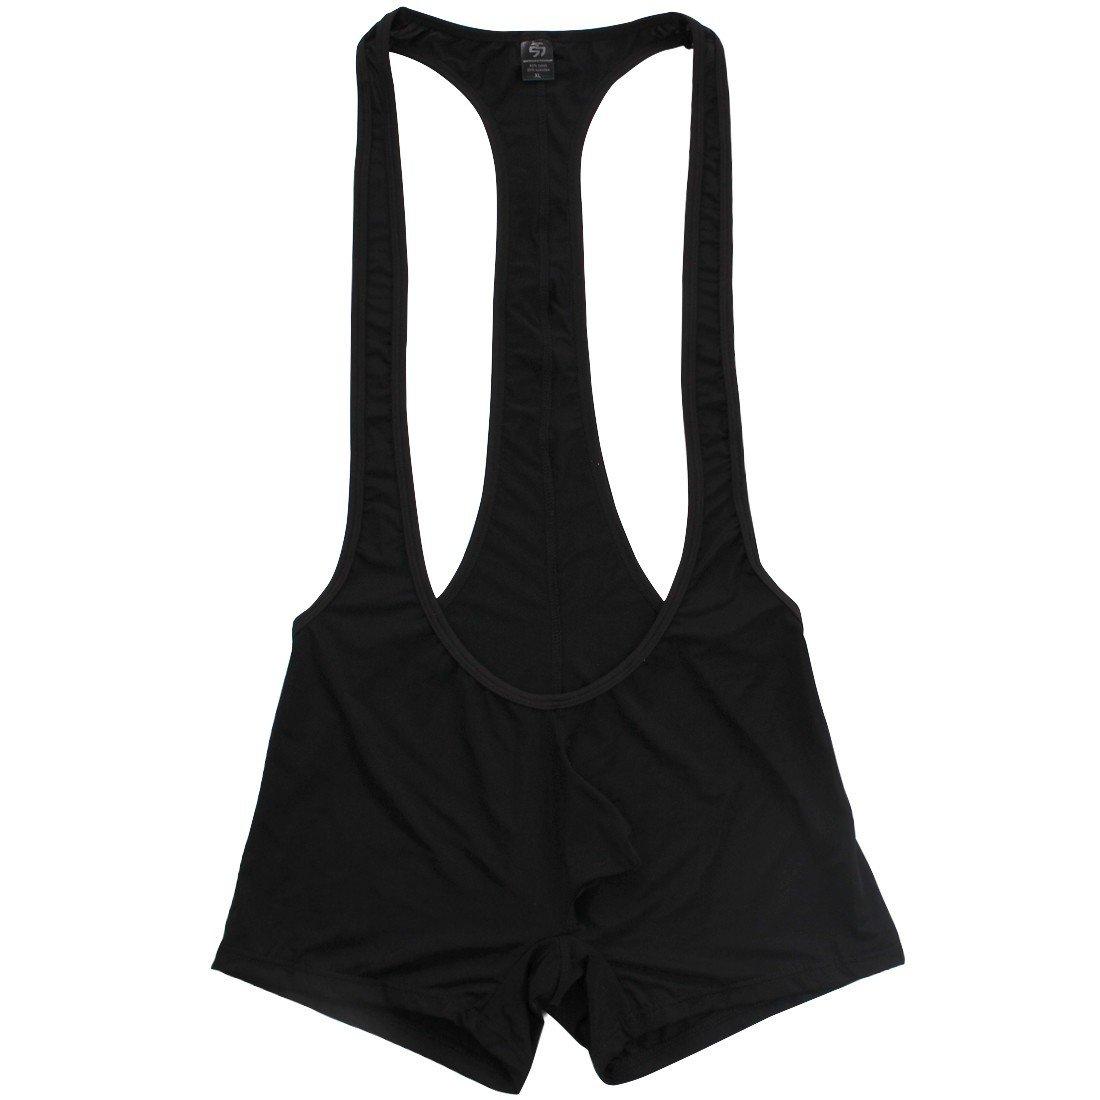 TiaoBug Men's Wrestling Singlet Smooth Freestyle Jockstrap Bodysuit Underwear Black Medium by TiaoBug